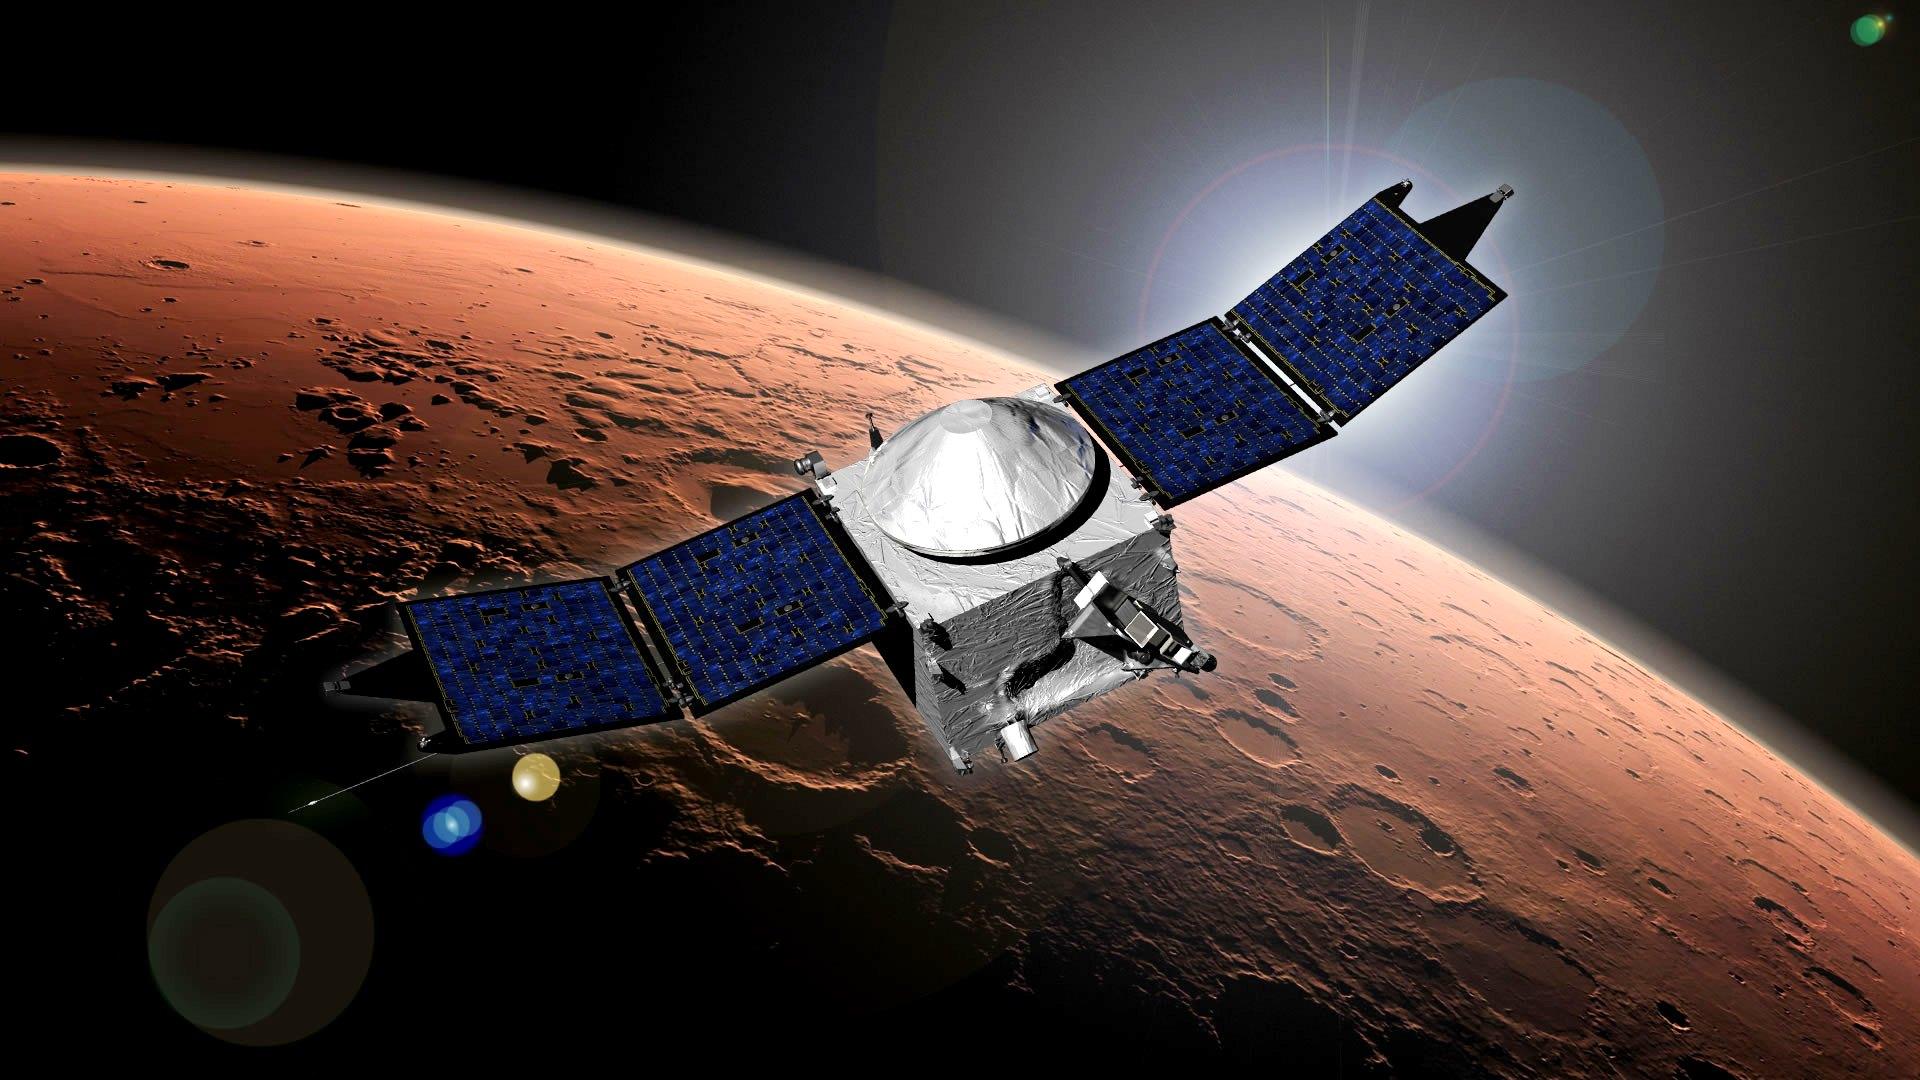 NASA's MAVEN Mars Orbiter